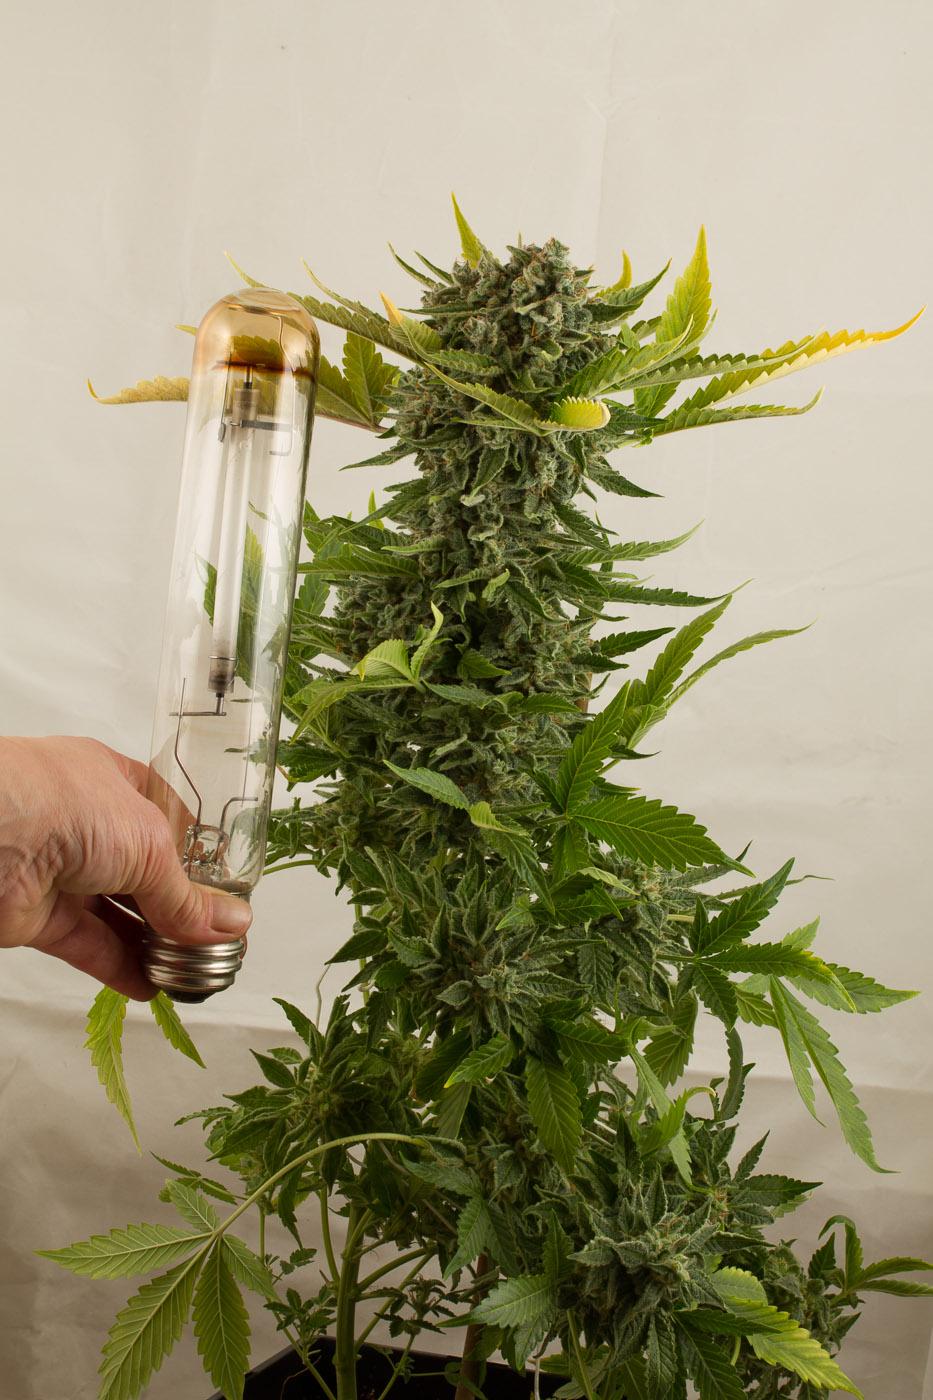 White Widow Autoflowering Buy White Widow Auto Cannabis Seeds